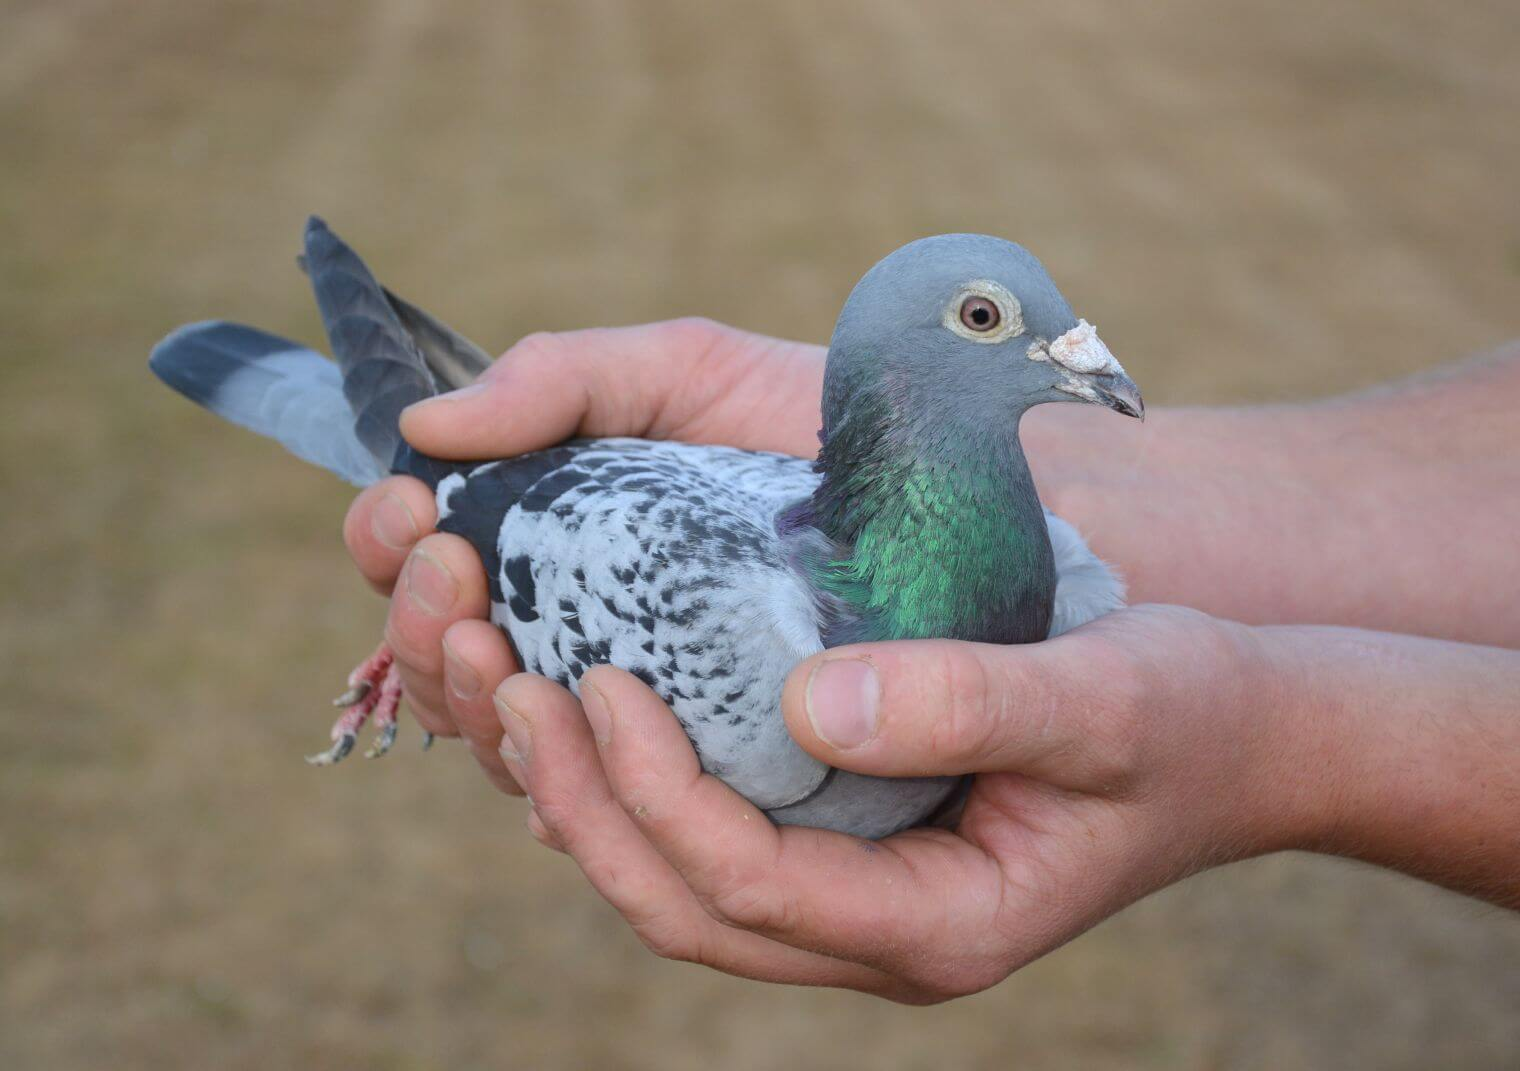 Ciri-Ciri Burung Merpati yang Baik dan Berkualitas Juara